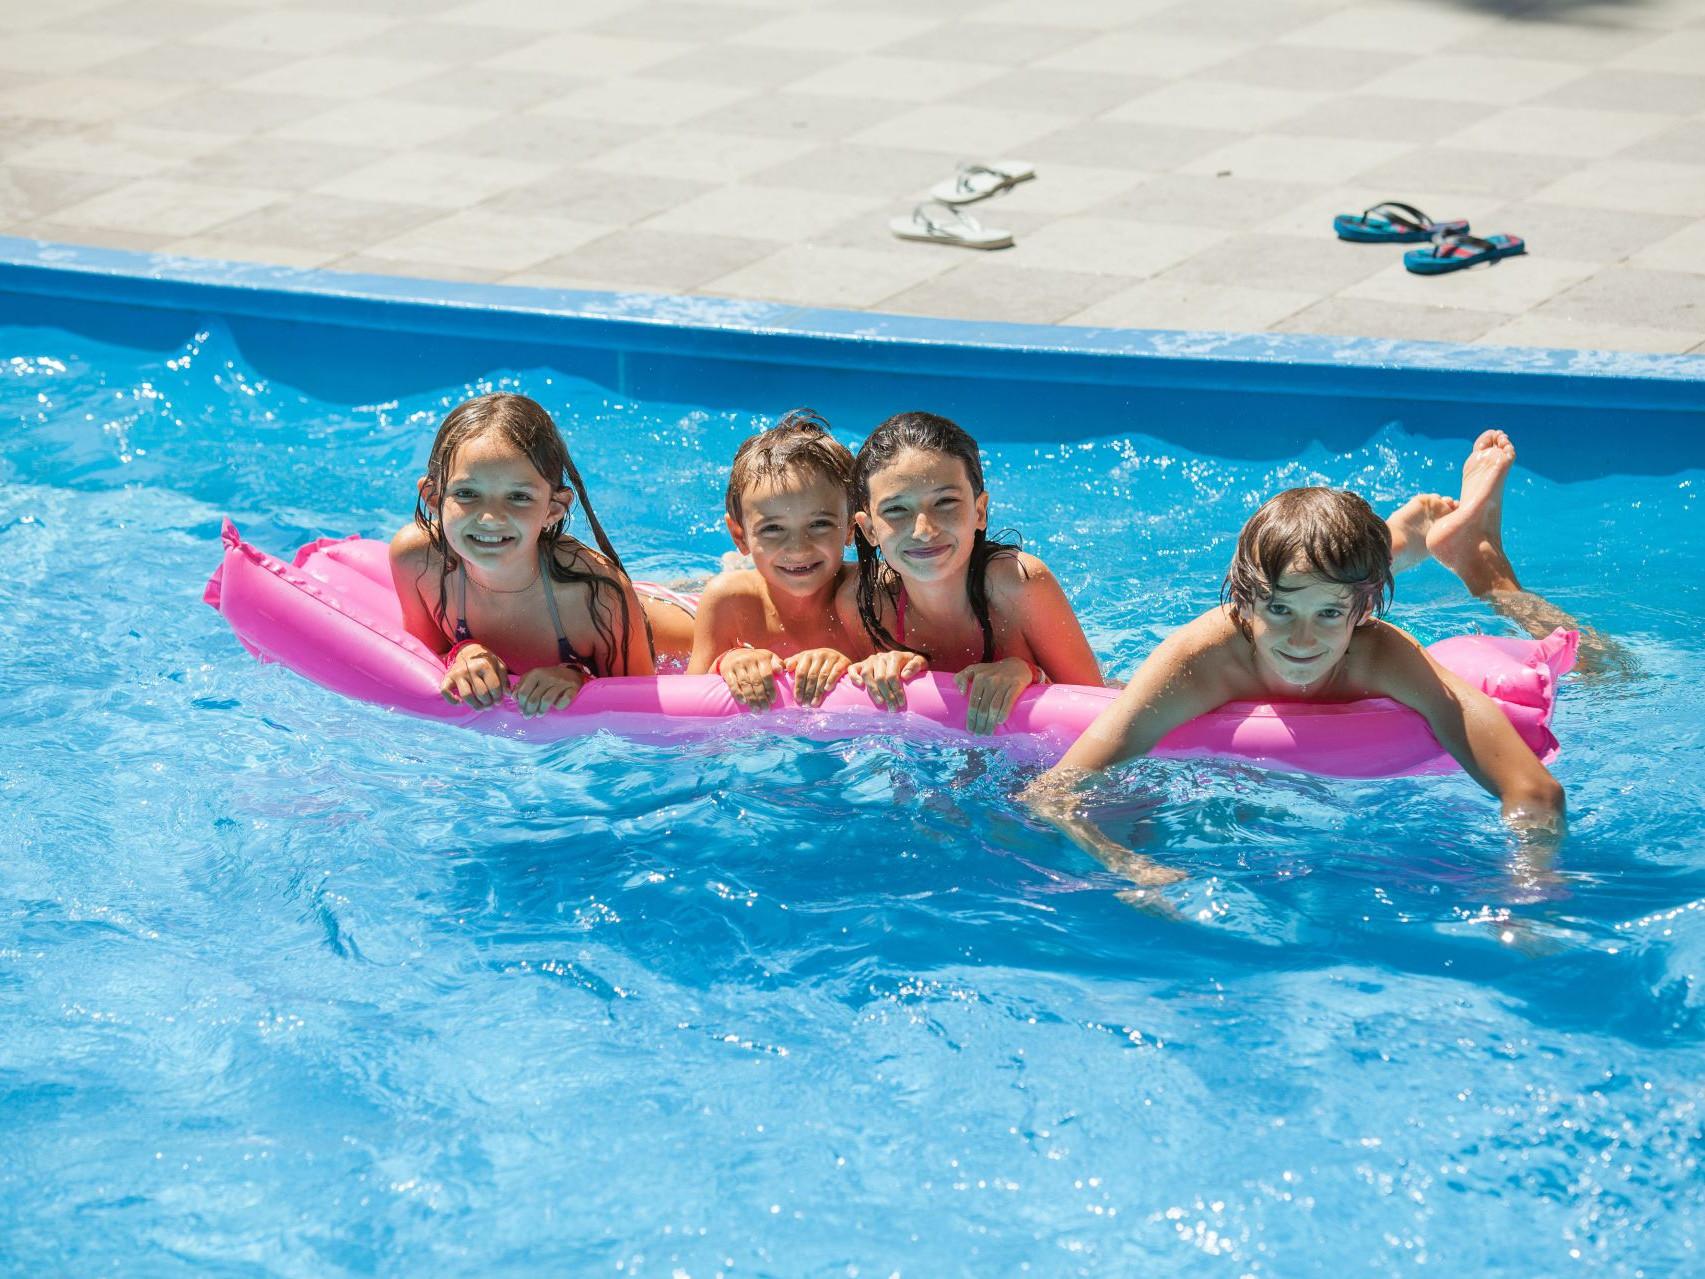 kids club 09 14845841663 o uai - Zora Hotel